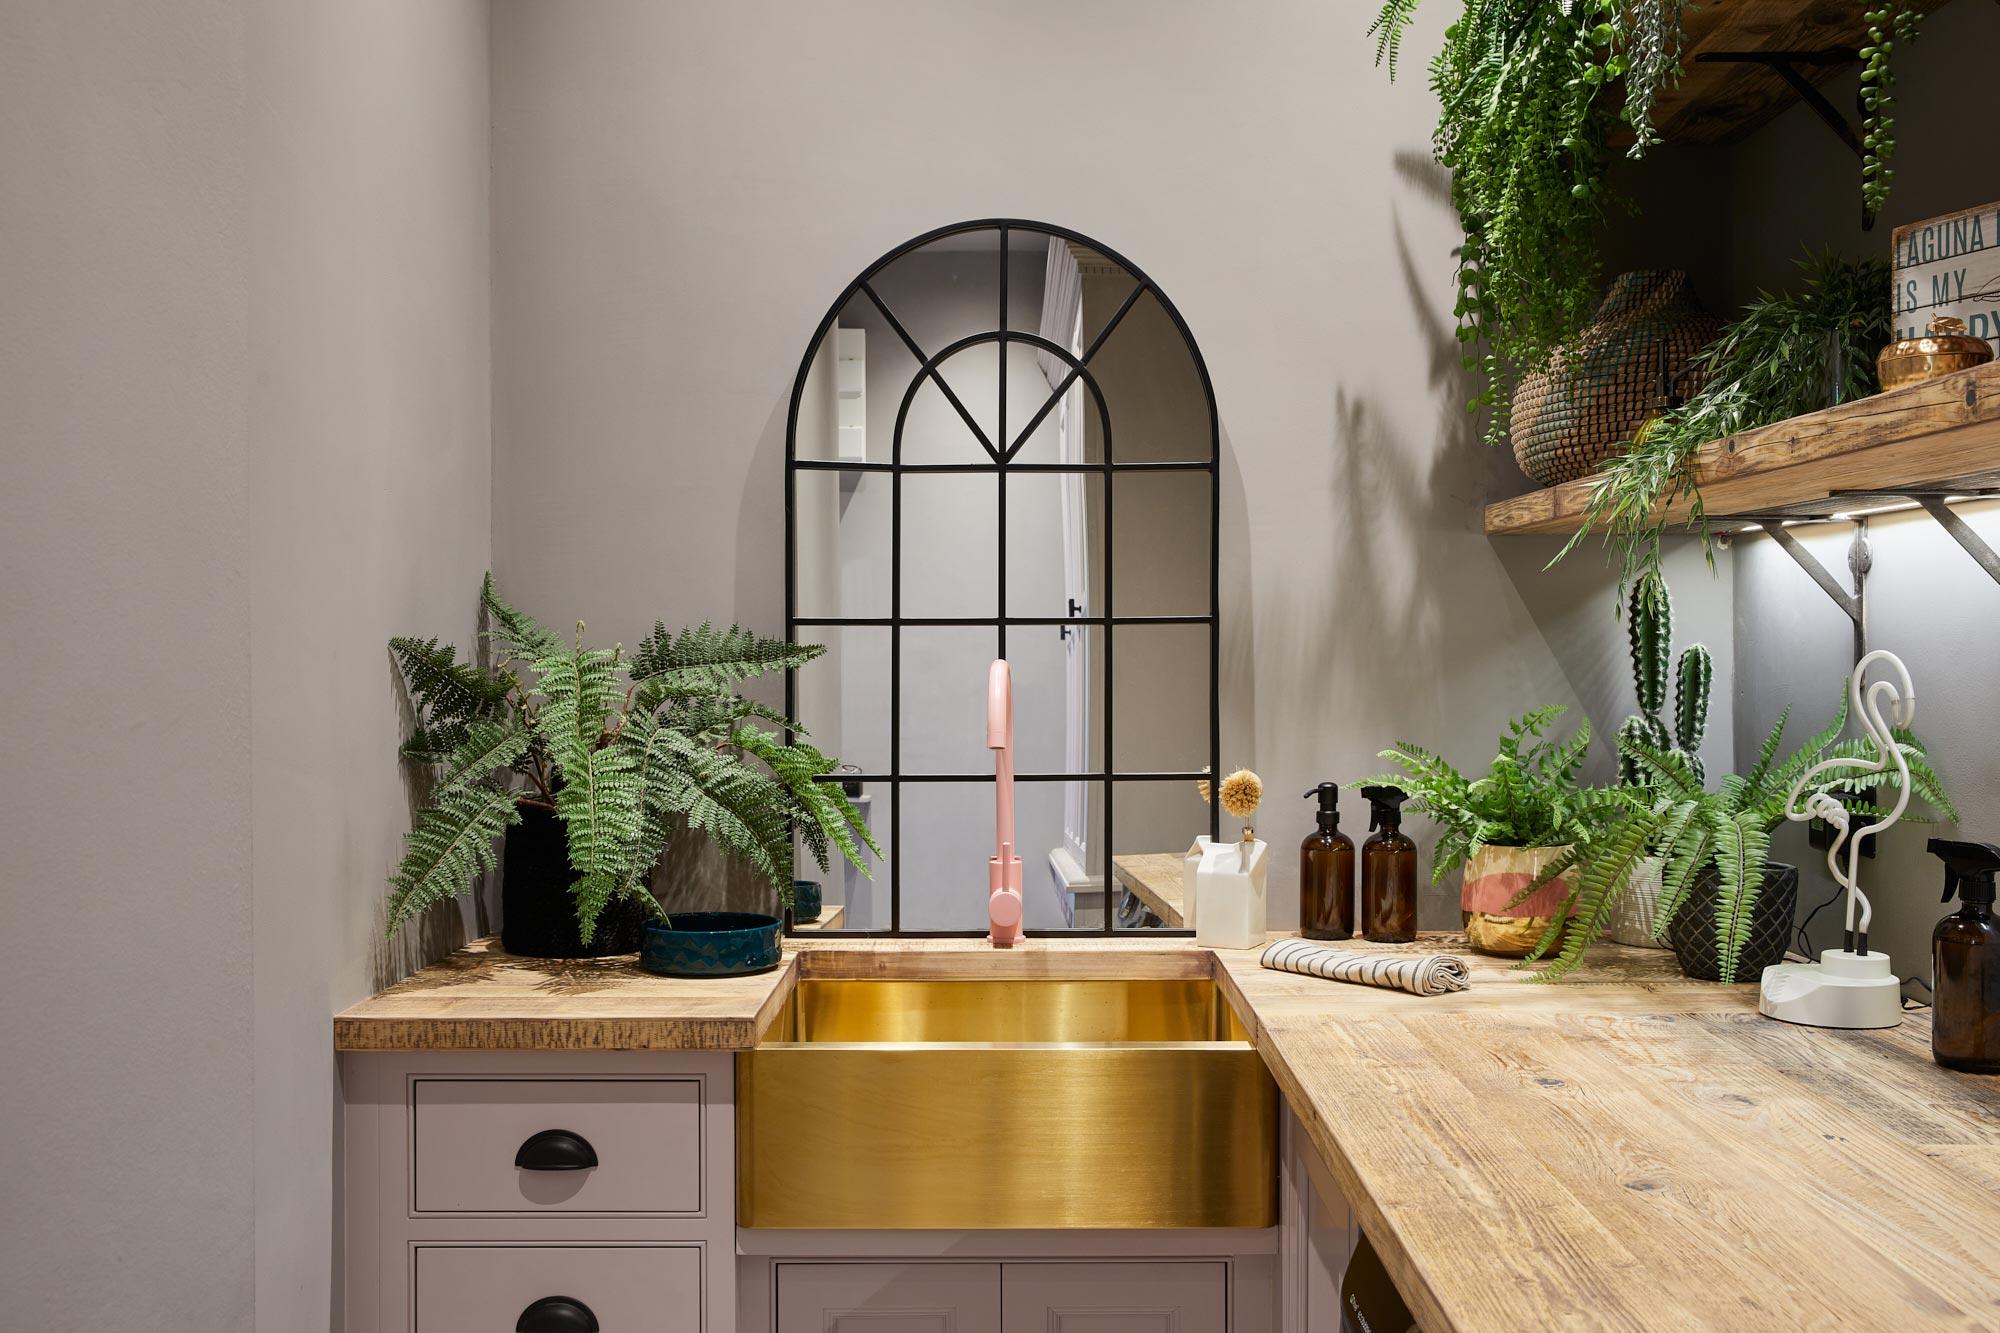 Brass belfast sink with pink tap